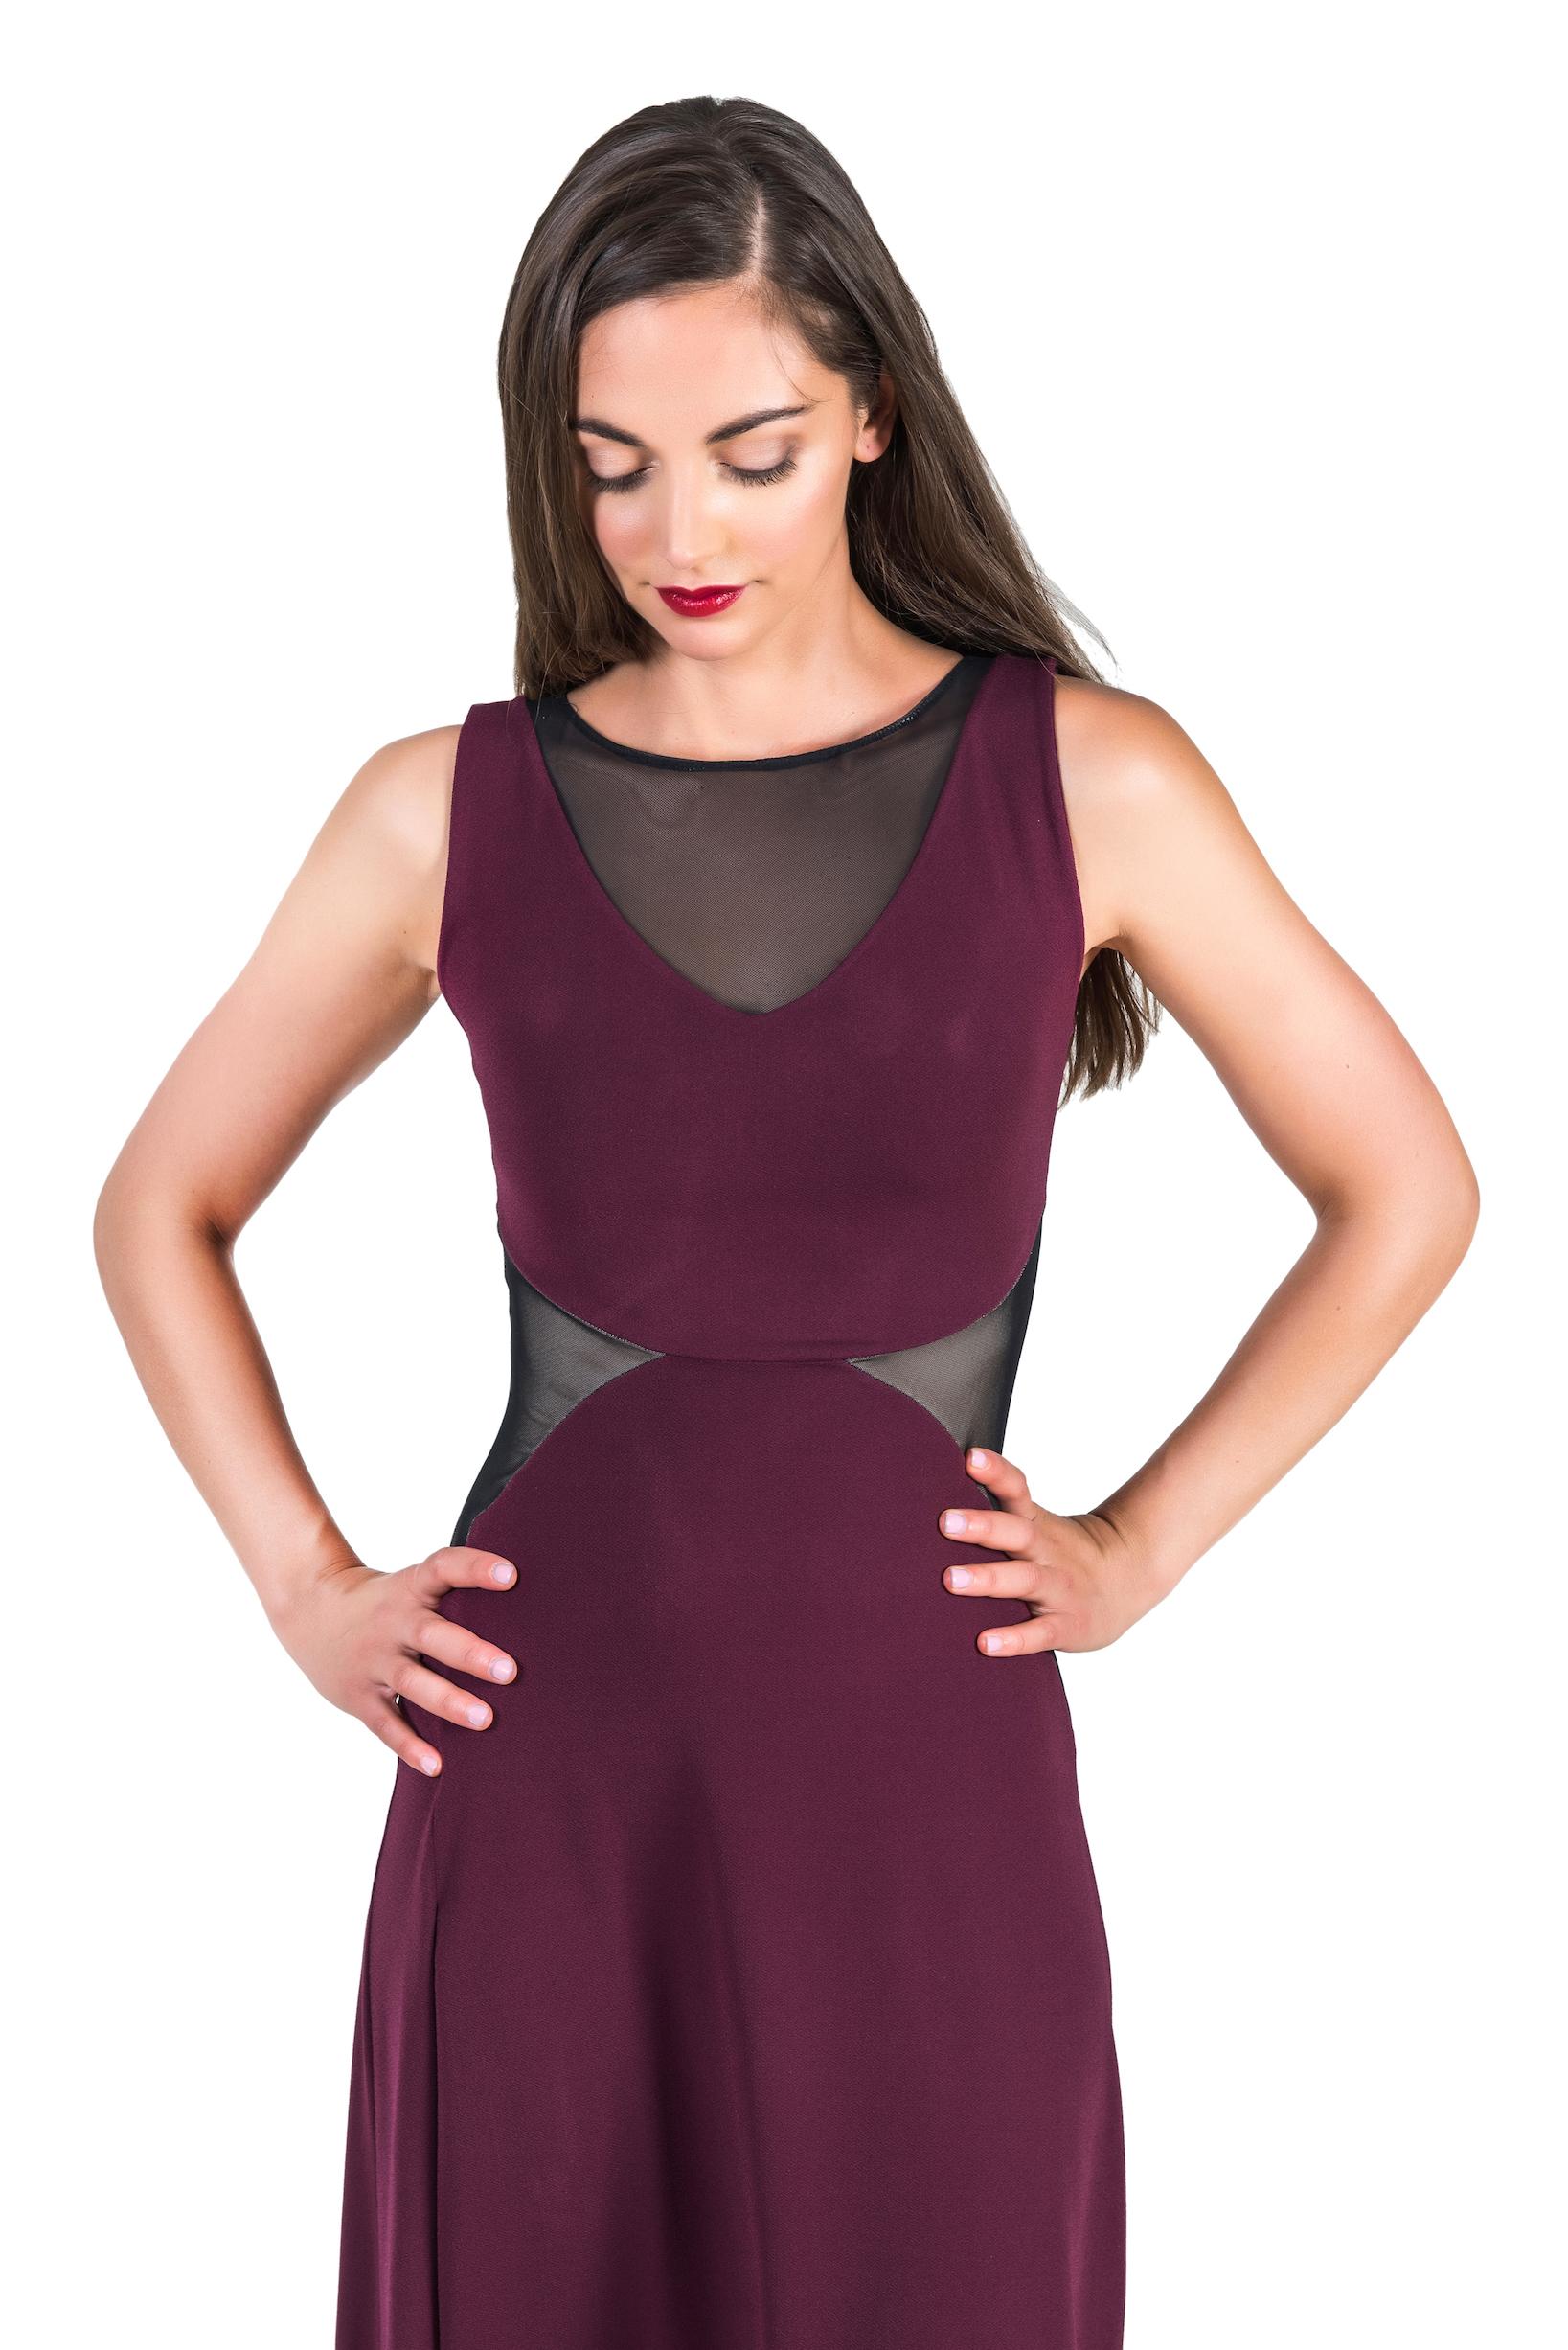 Verona Tango Dress in eggplant and black tulle